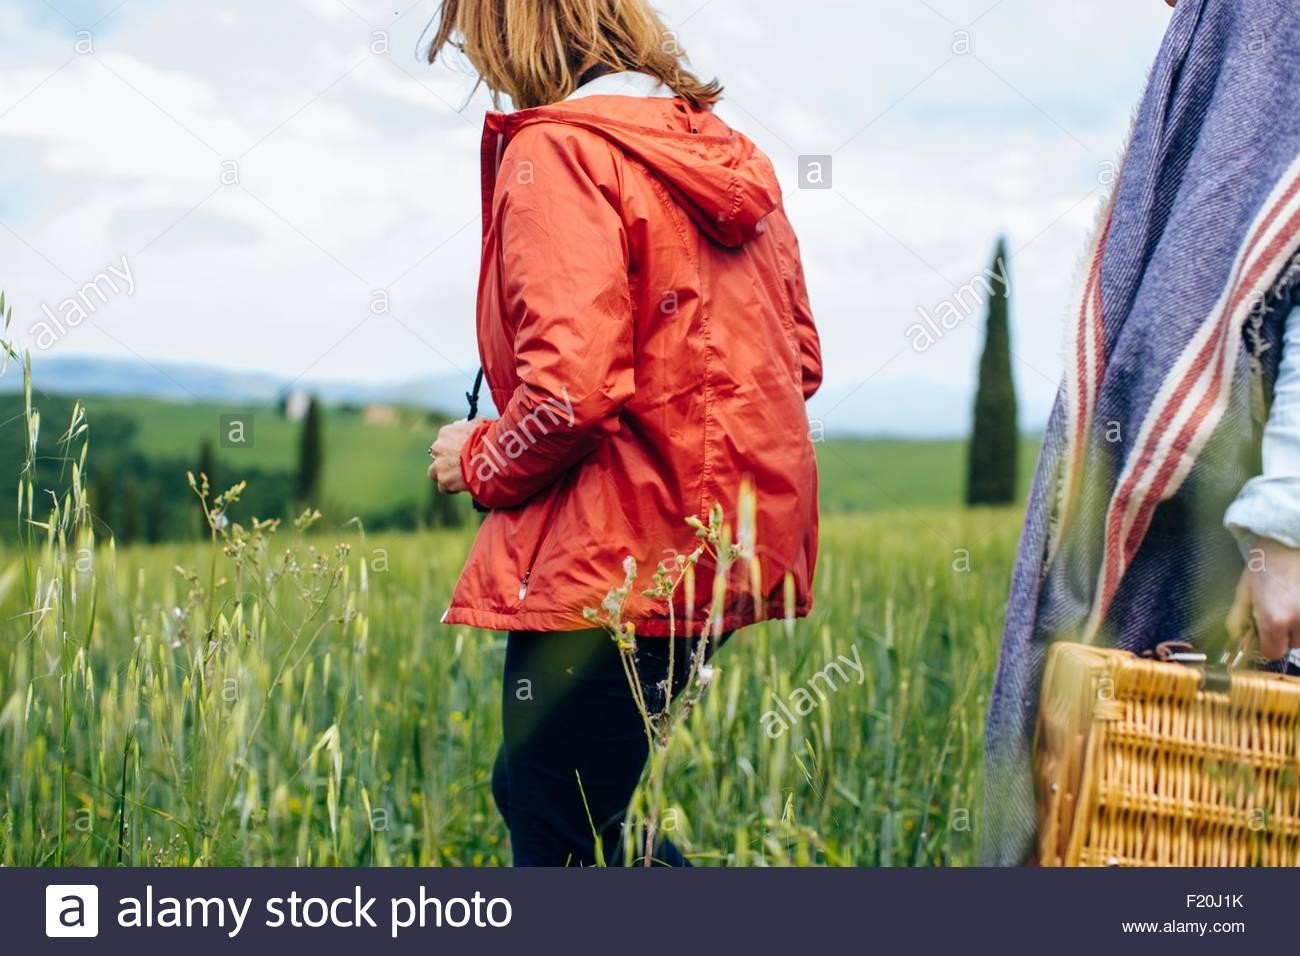 Beschnitten, Aufnahme von zwei Reife Frauen einen Spaziergang im Weizenfeld, Toskana, Italien Stockbild